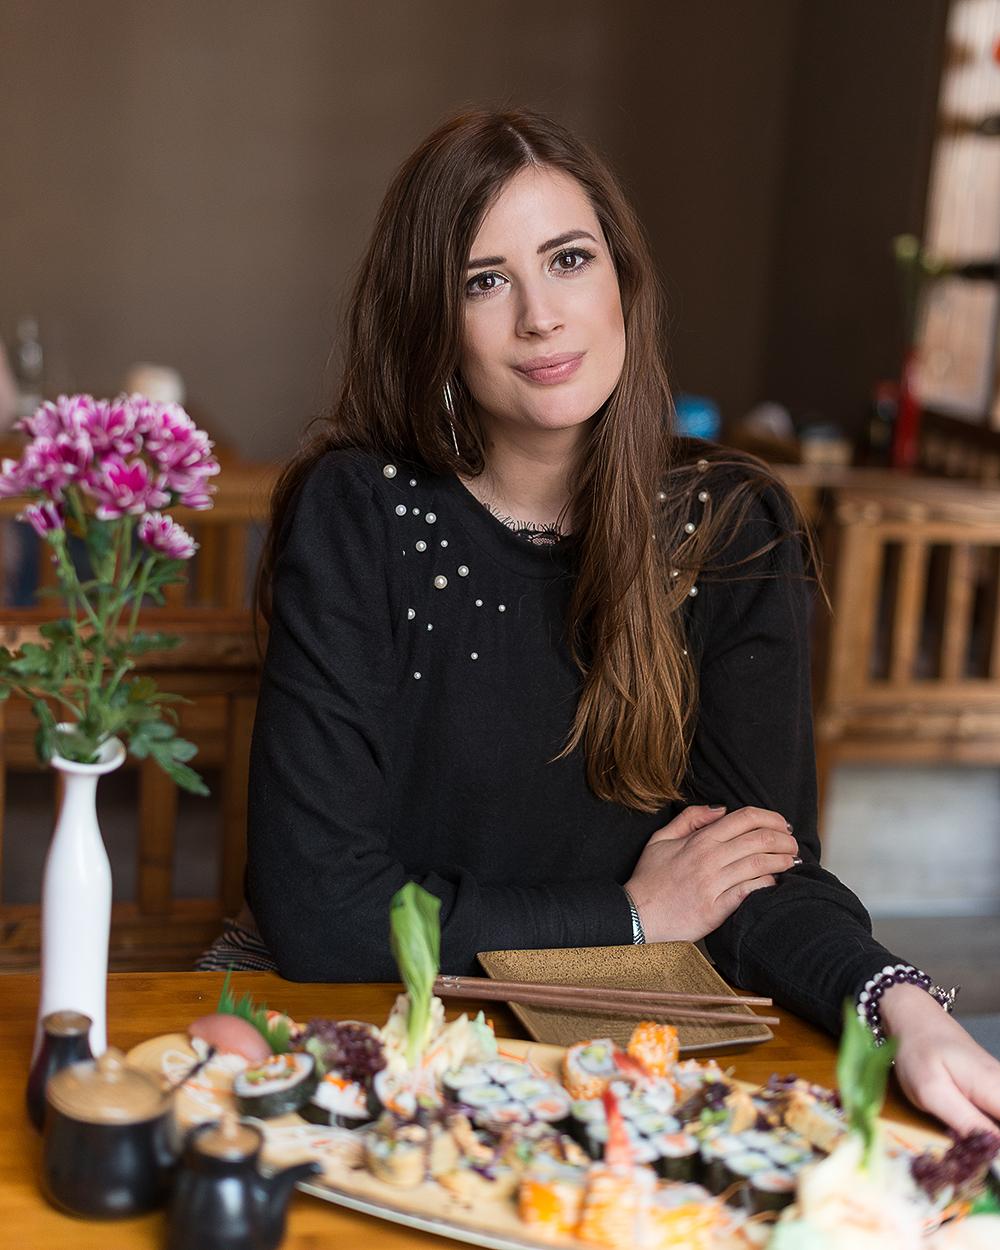 Monatsrückblick im März-Berlin Blog-Sushi-andysparkles